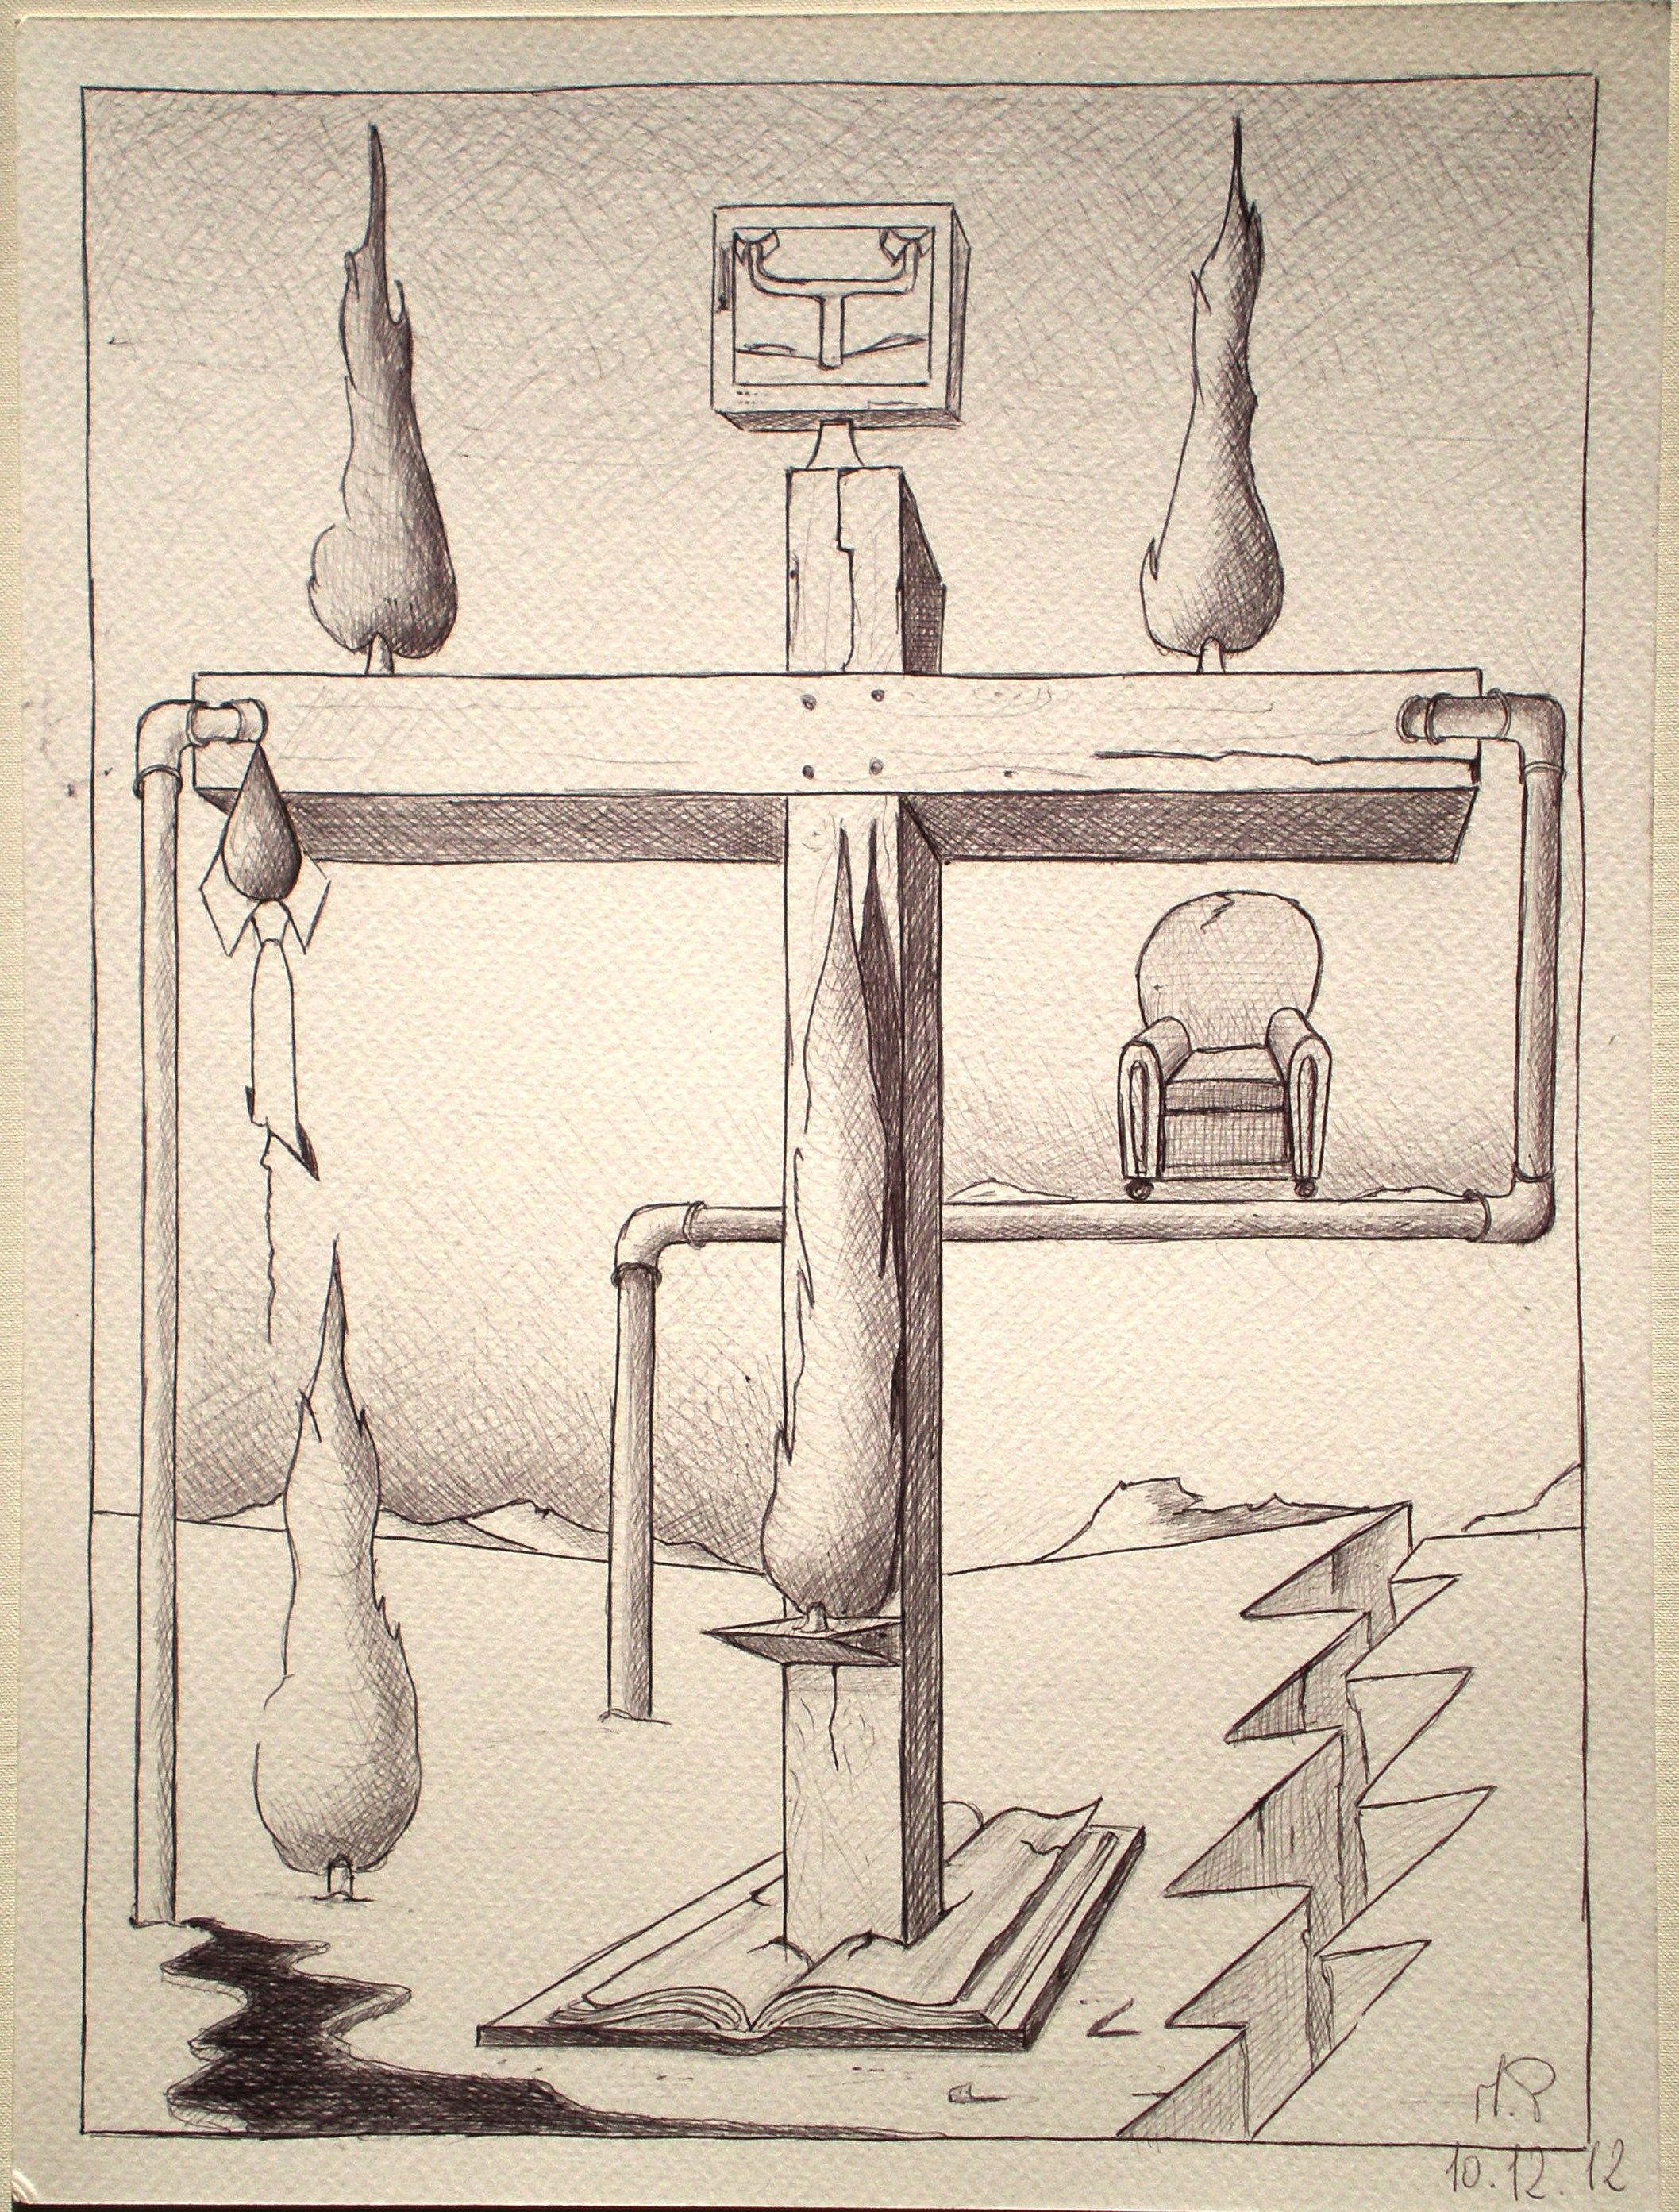 Tempi moderni (modern Times), 2012 disegno a penna (pen and ink drawing) cm 24x32, Pasquale Mastrogiacomo, Acerno (SA).